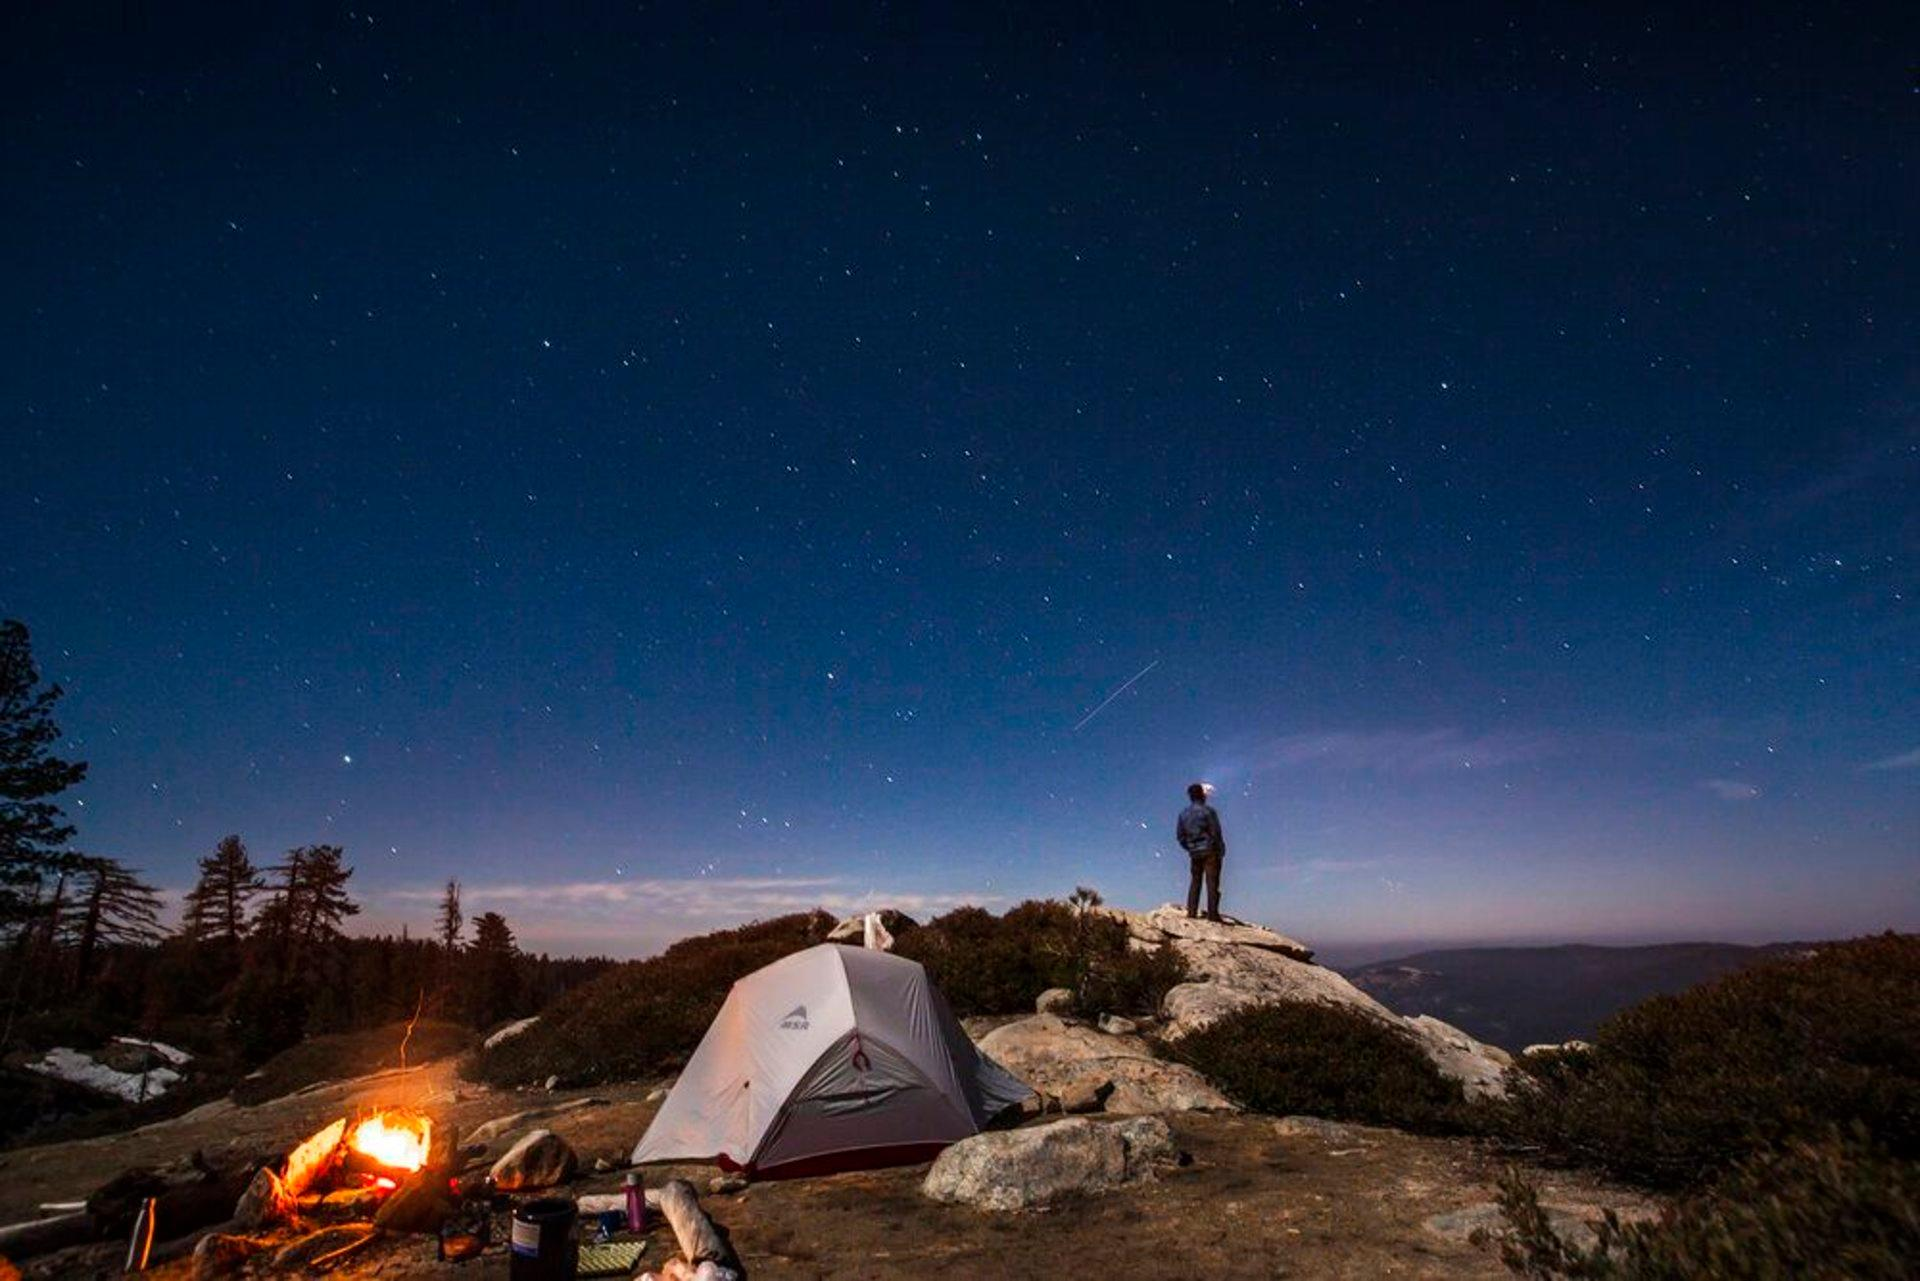 1 night backpacking trip to Yosemite National Park Thumbnail